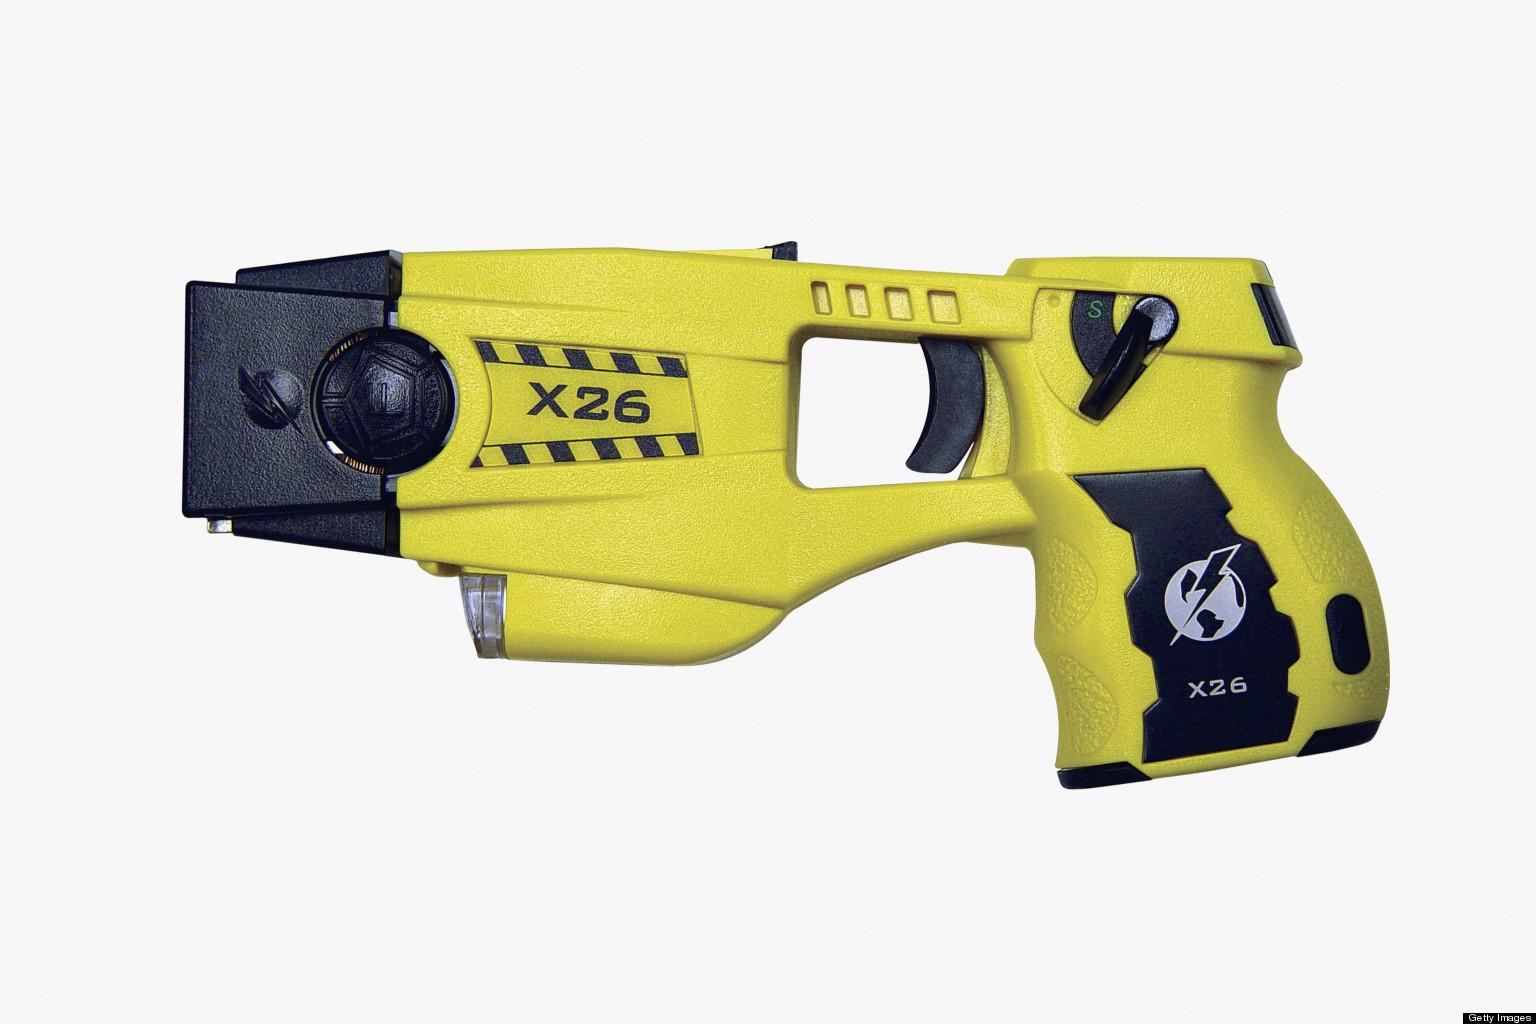 Tsa Confiscates Stun Gun At Bwi